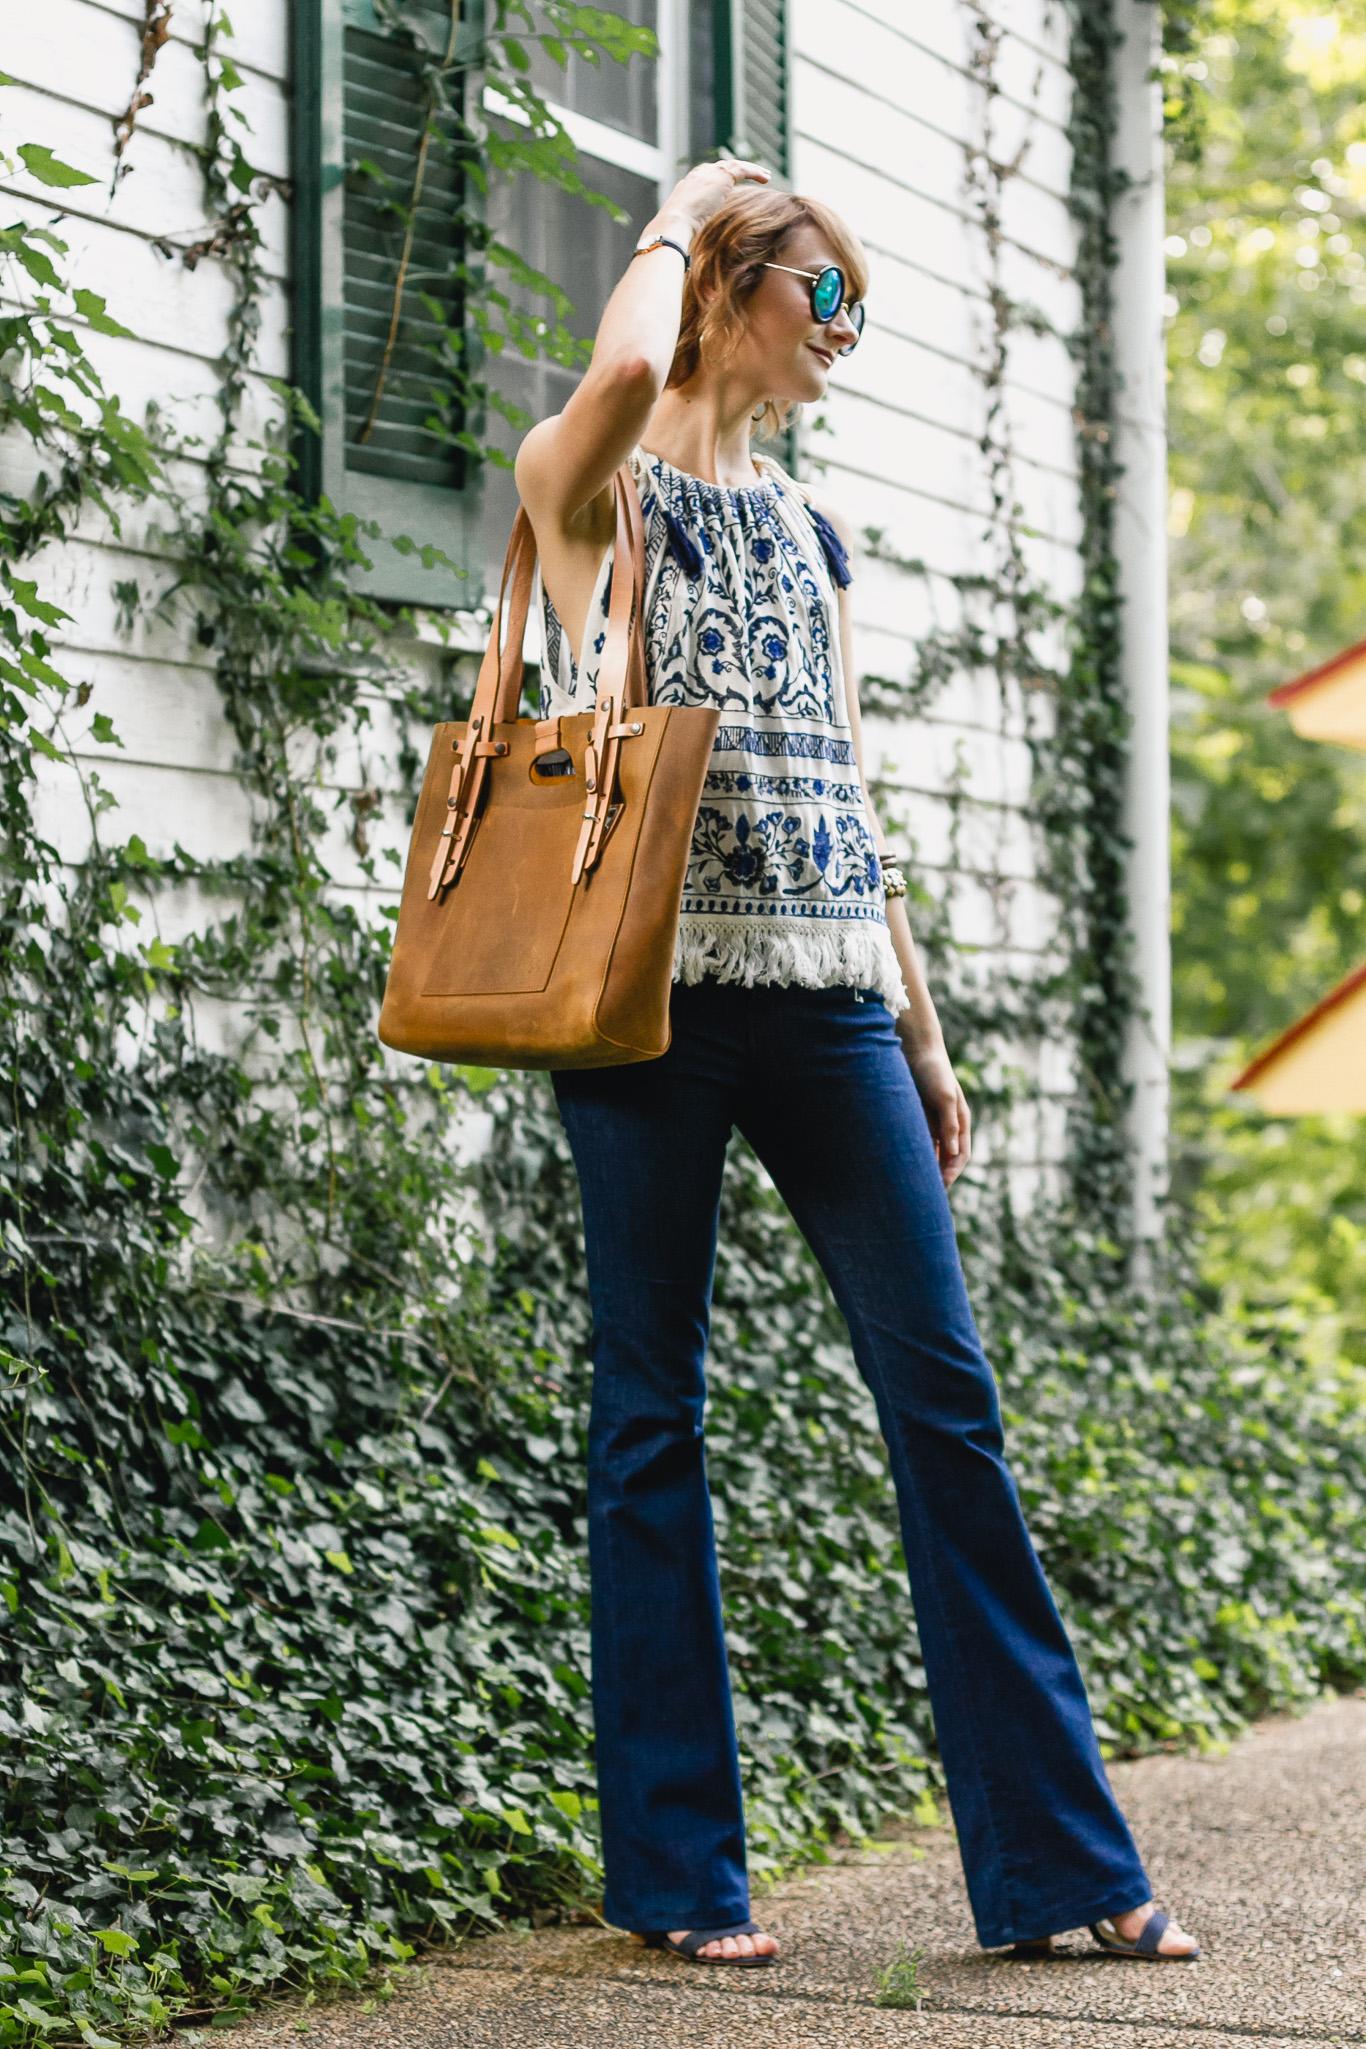 Mango top, J brand flare jeans, and Saddleback Leather bag